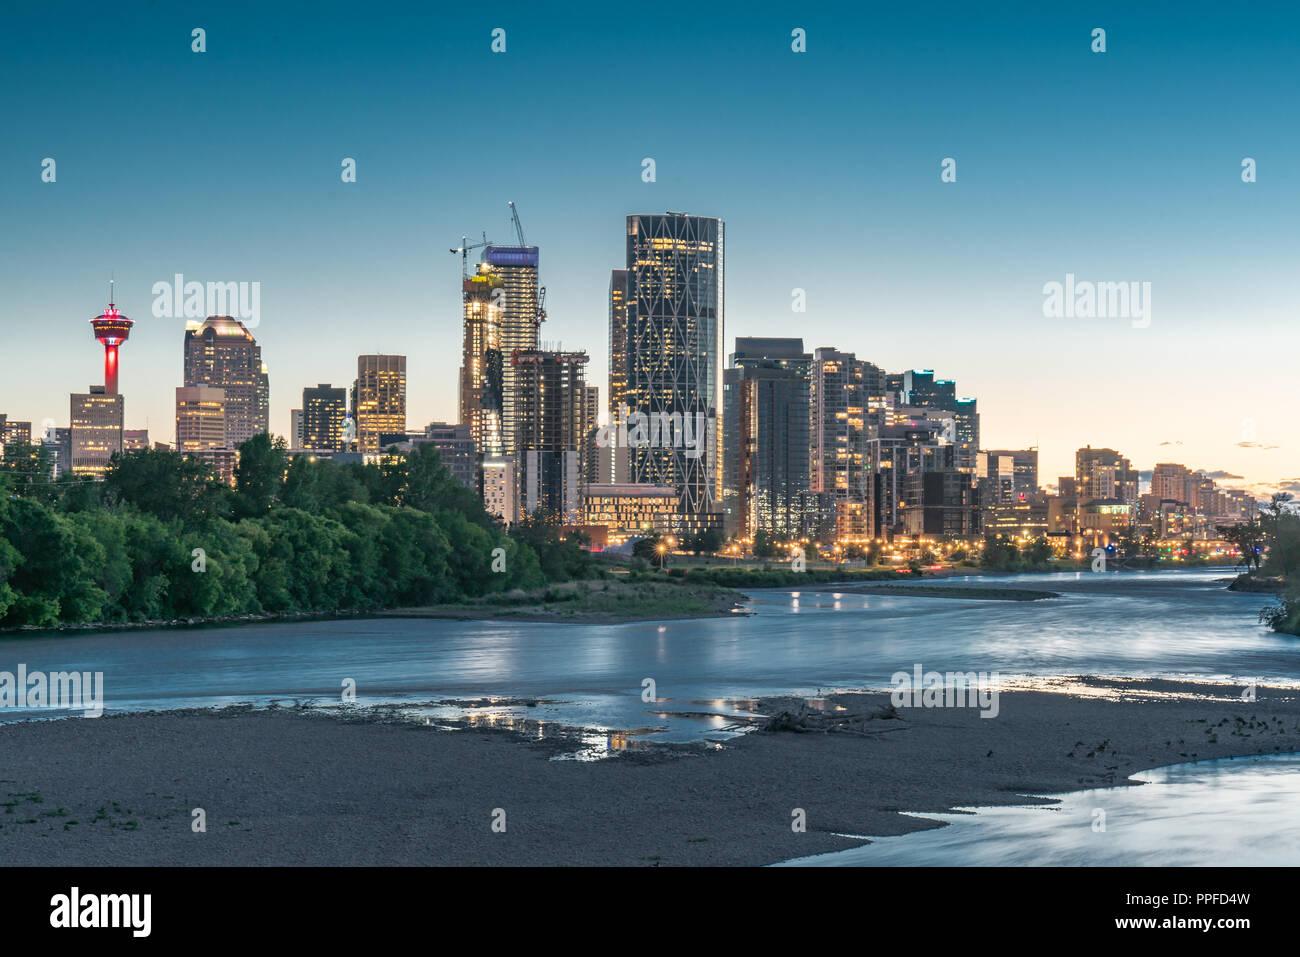 Night Skyline der Stadt Calgary, Alberta, Kanada entlang des Bow River Stockbild